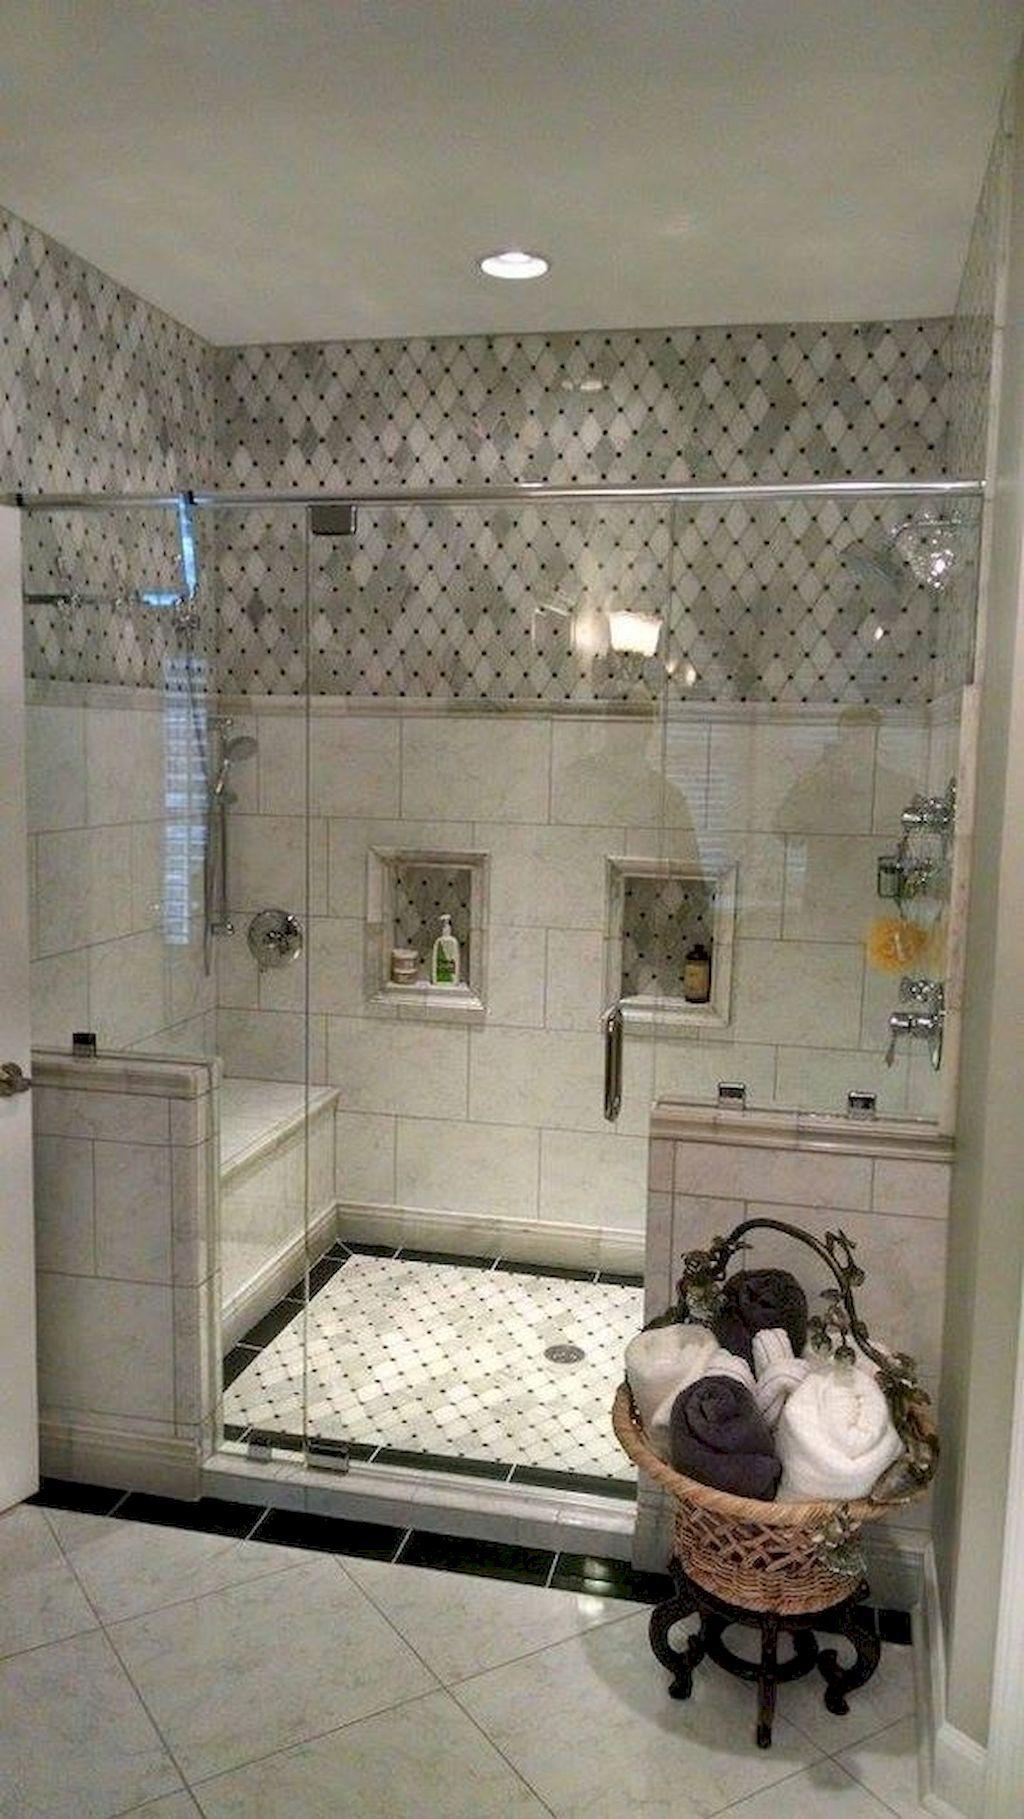 75 Efficient Small Bathroom Remodel Design Ideas - Roomaniac.com